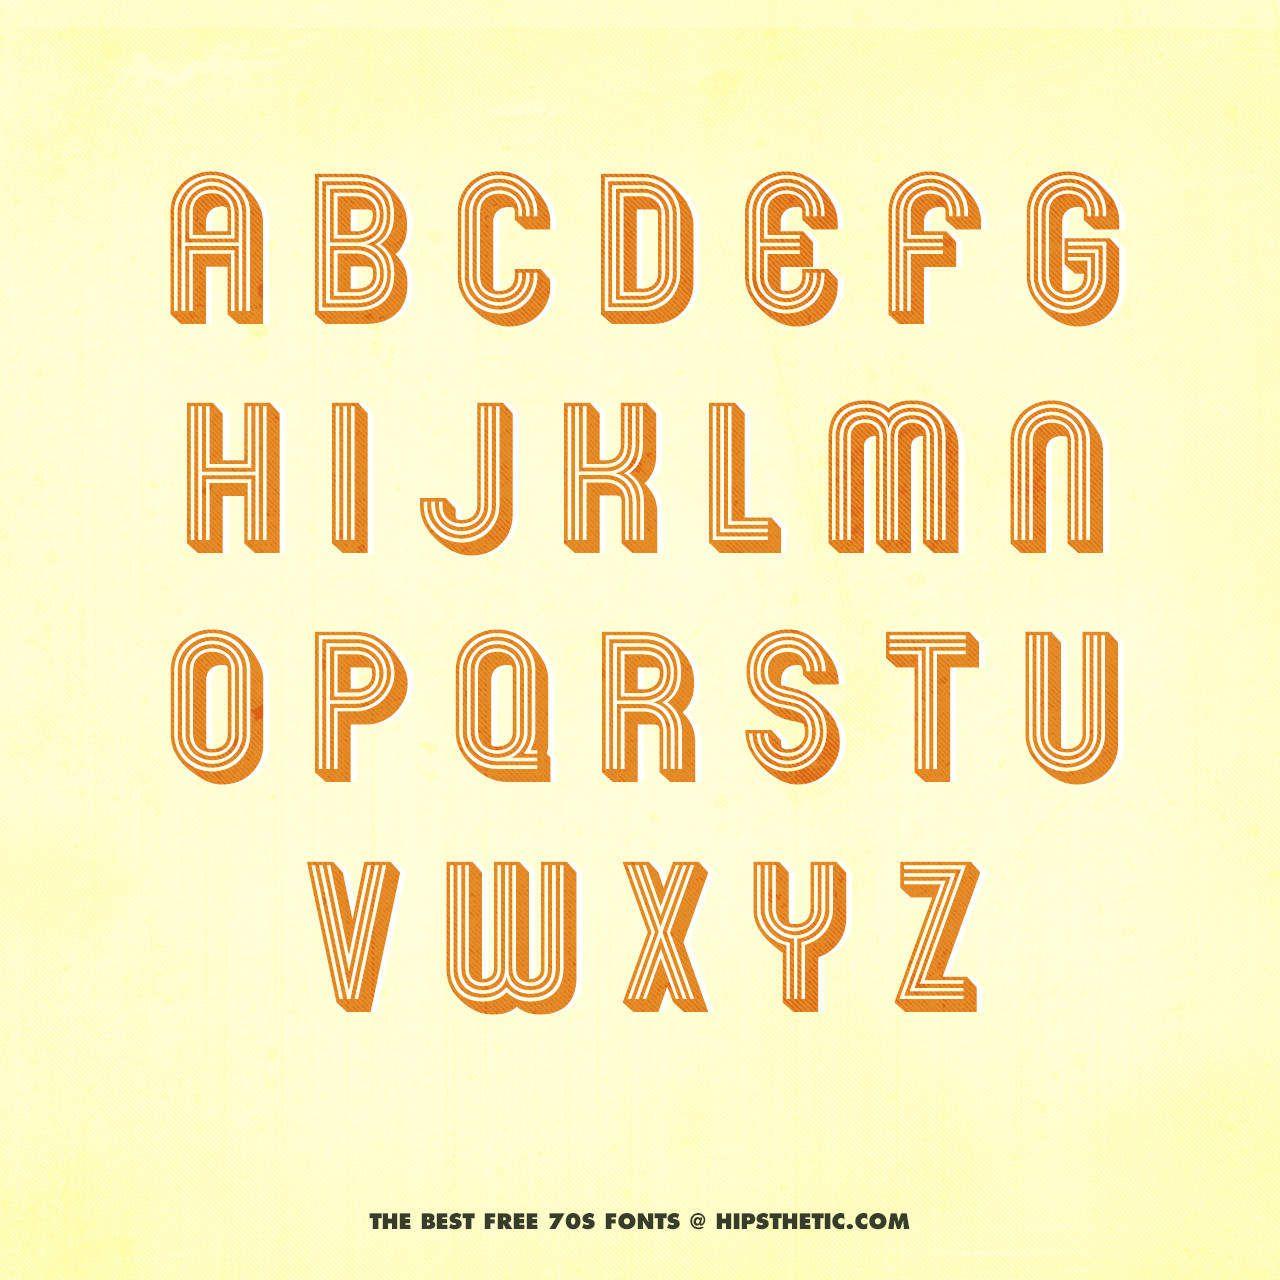 10 Best Free 3D Fonts Available Online | Fonts | 1970s font